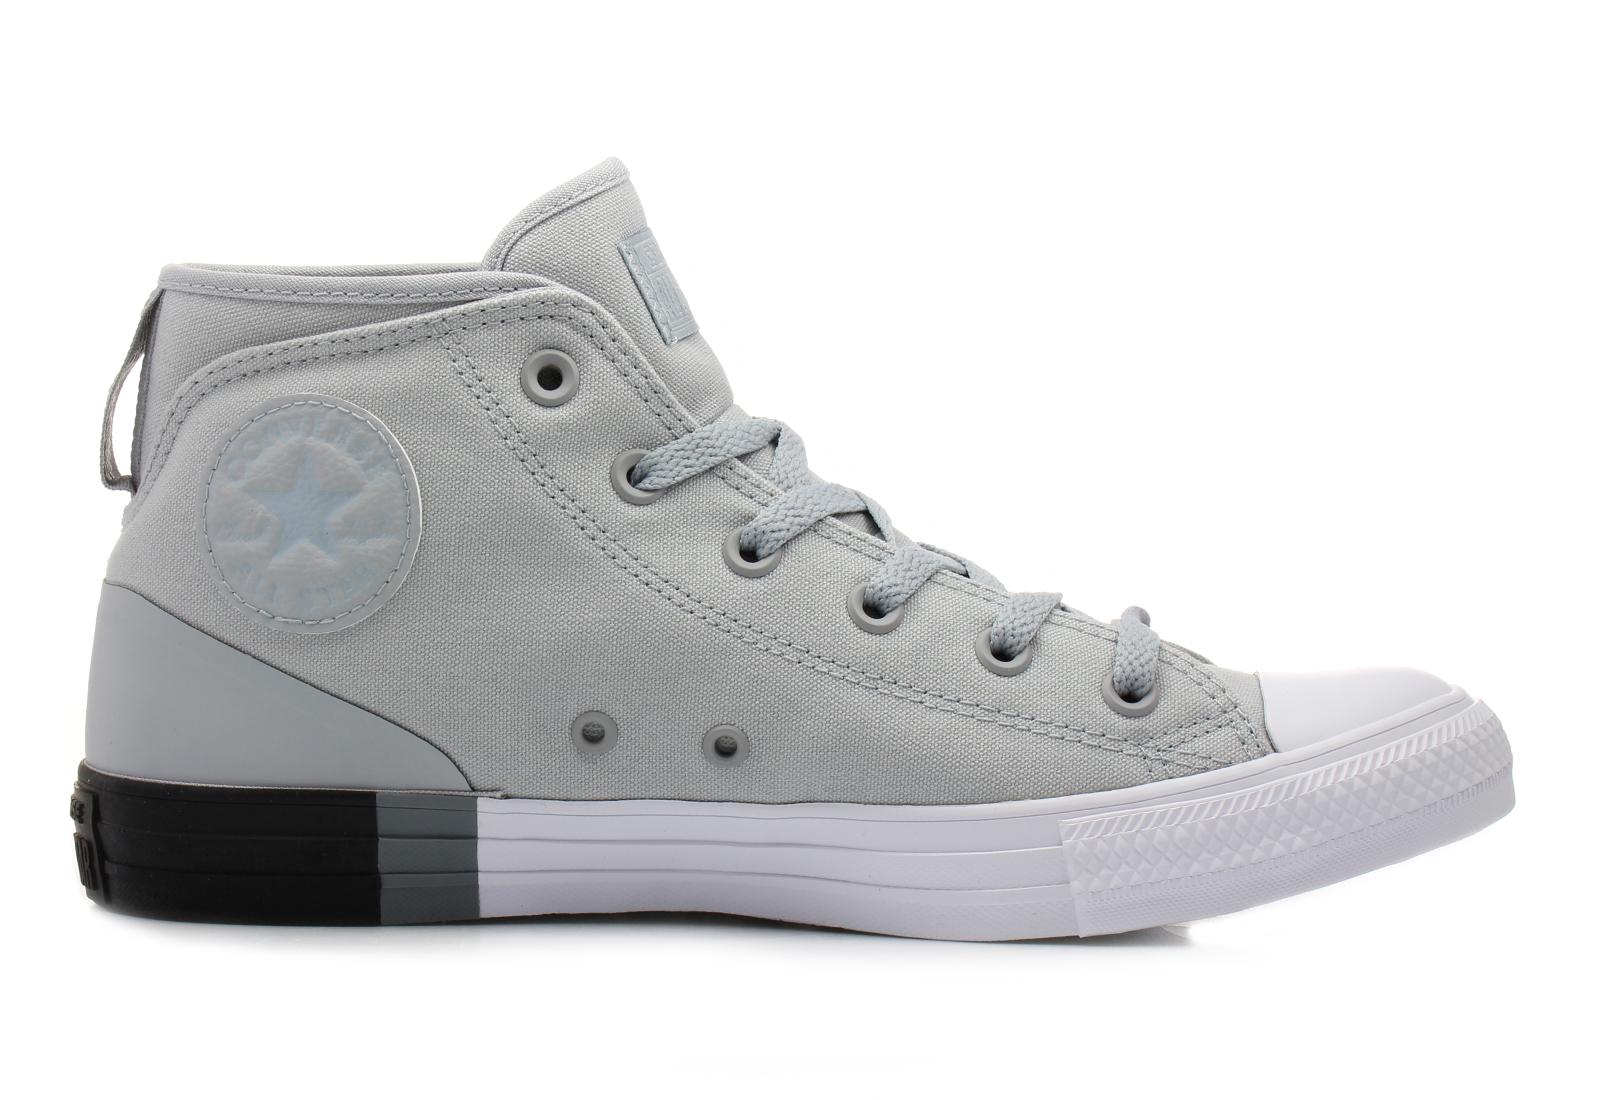 Converse Tenisky - Chuck Taylor All Star Syde Street ... 6e5e7b4637c